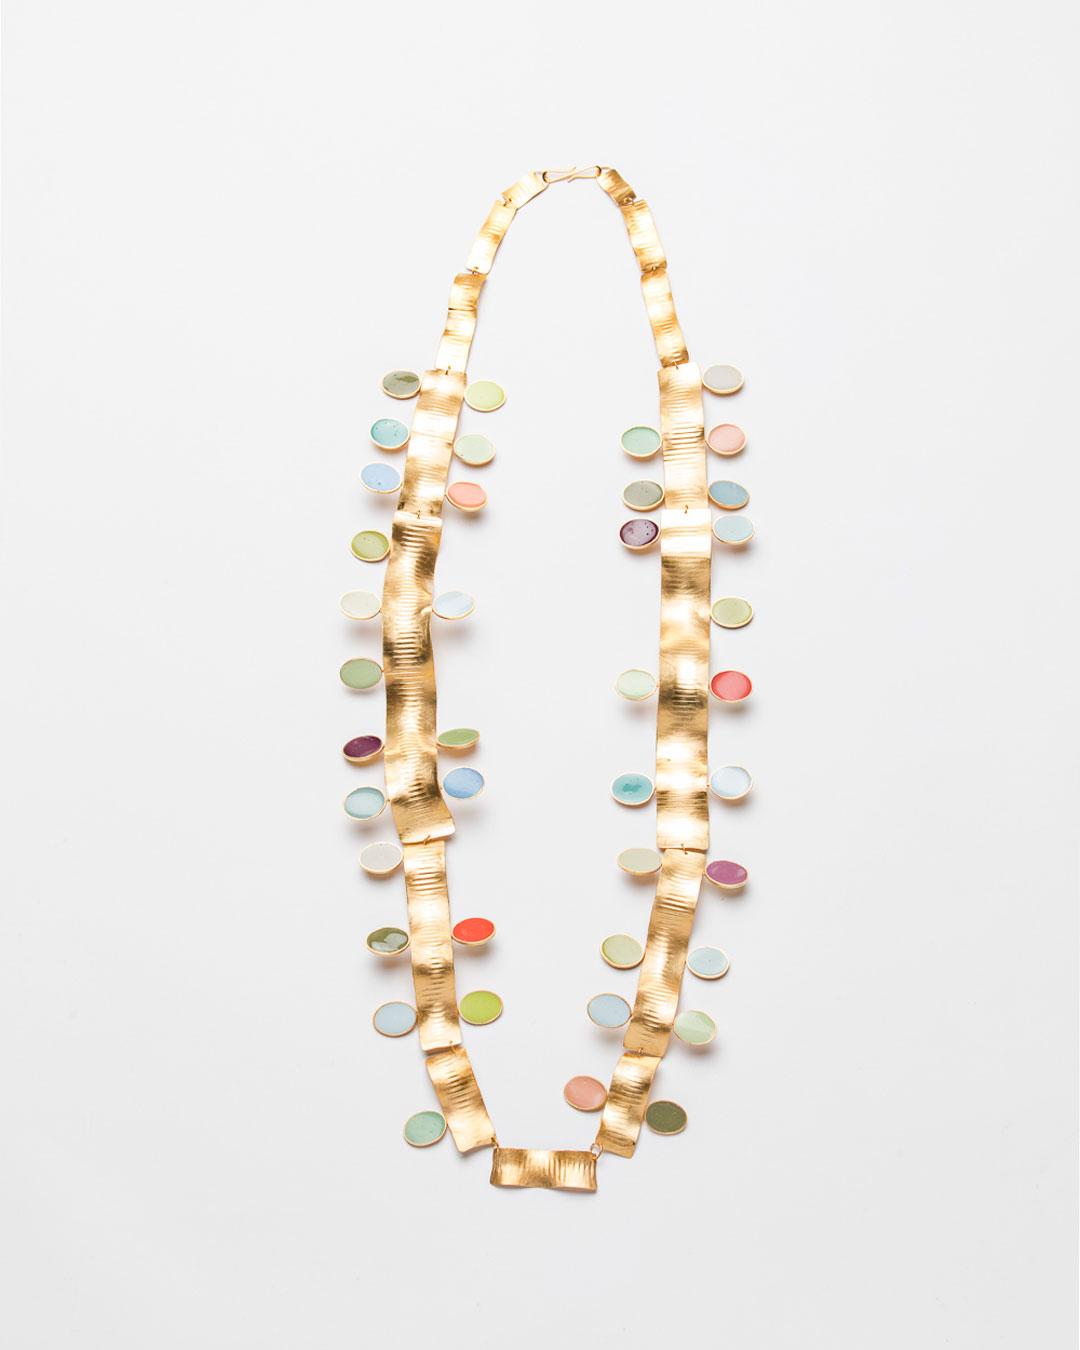 Margit Jäschke, The Golden Thread: 40 Coloured Years, 2019, necklace; gold, gold-plated silver, epoxy, 500 x 160 x 20 mm, €9700